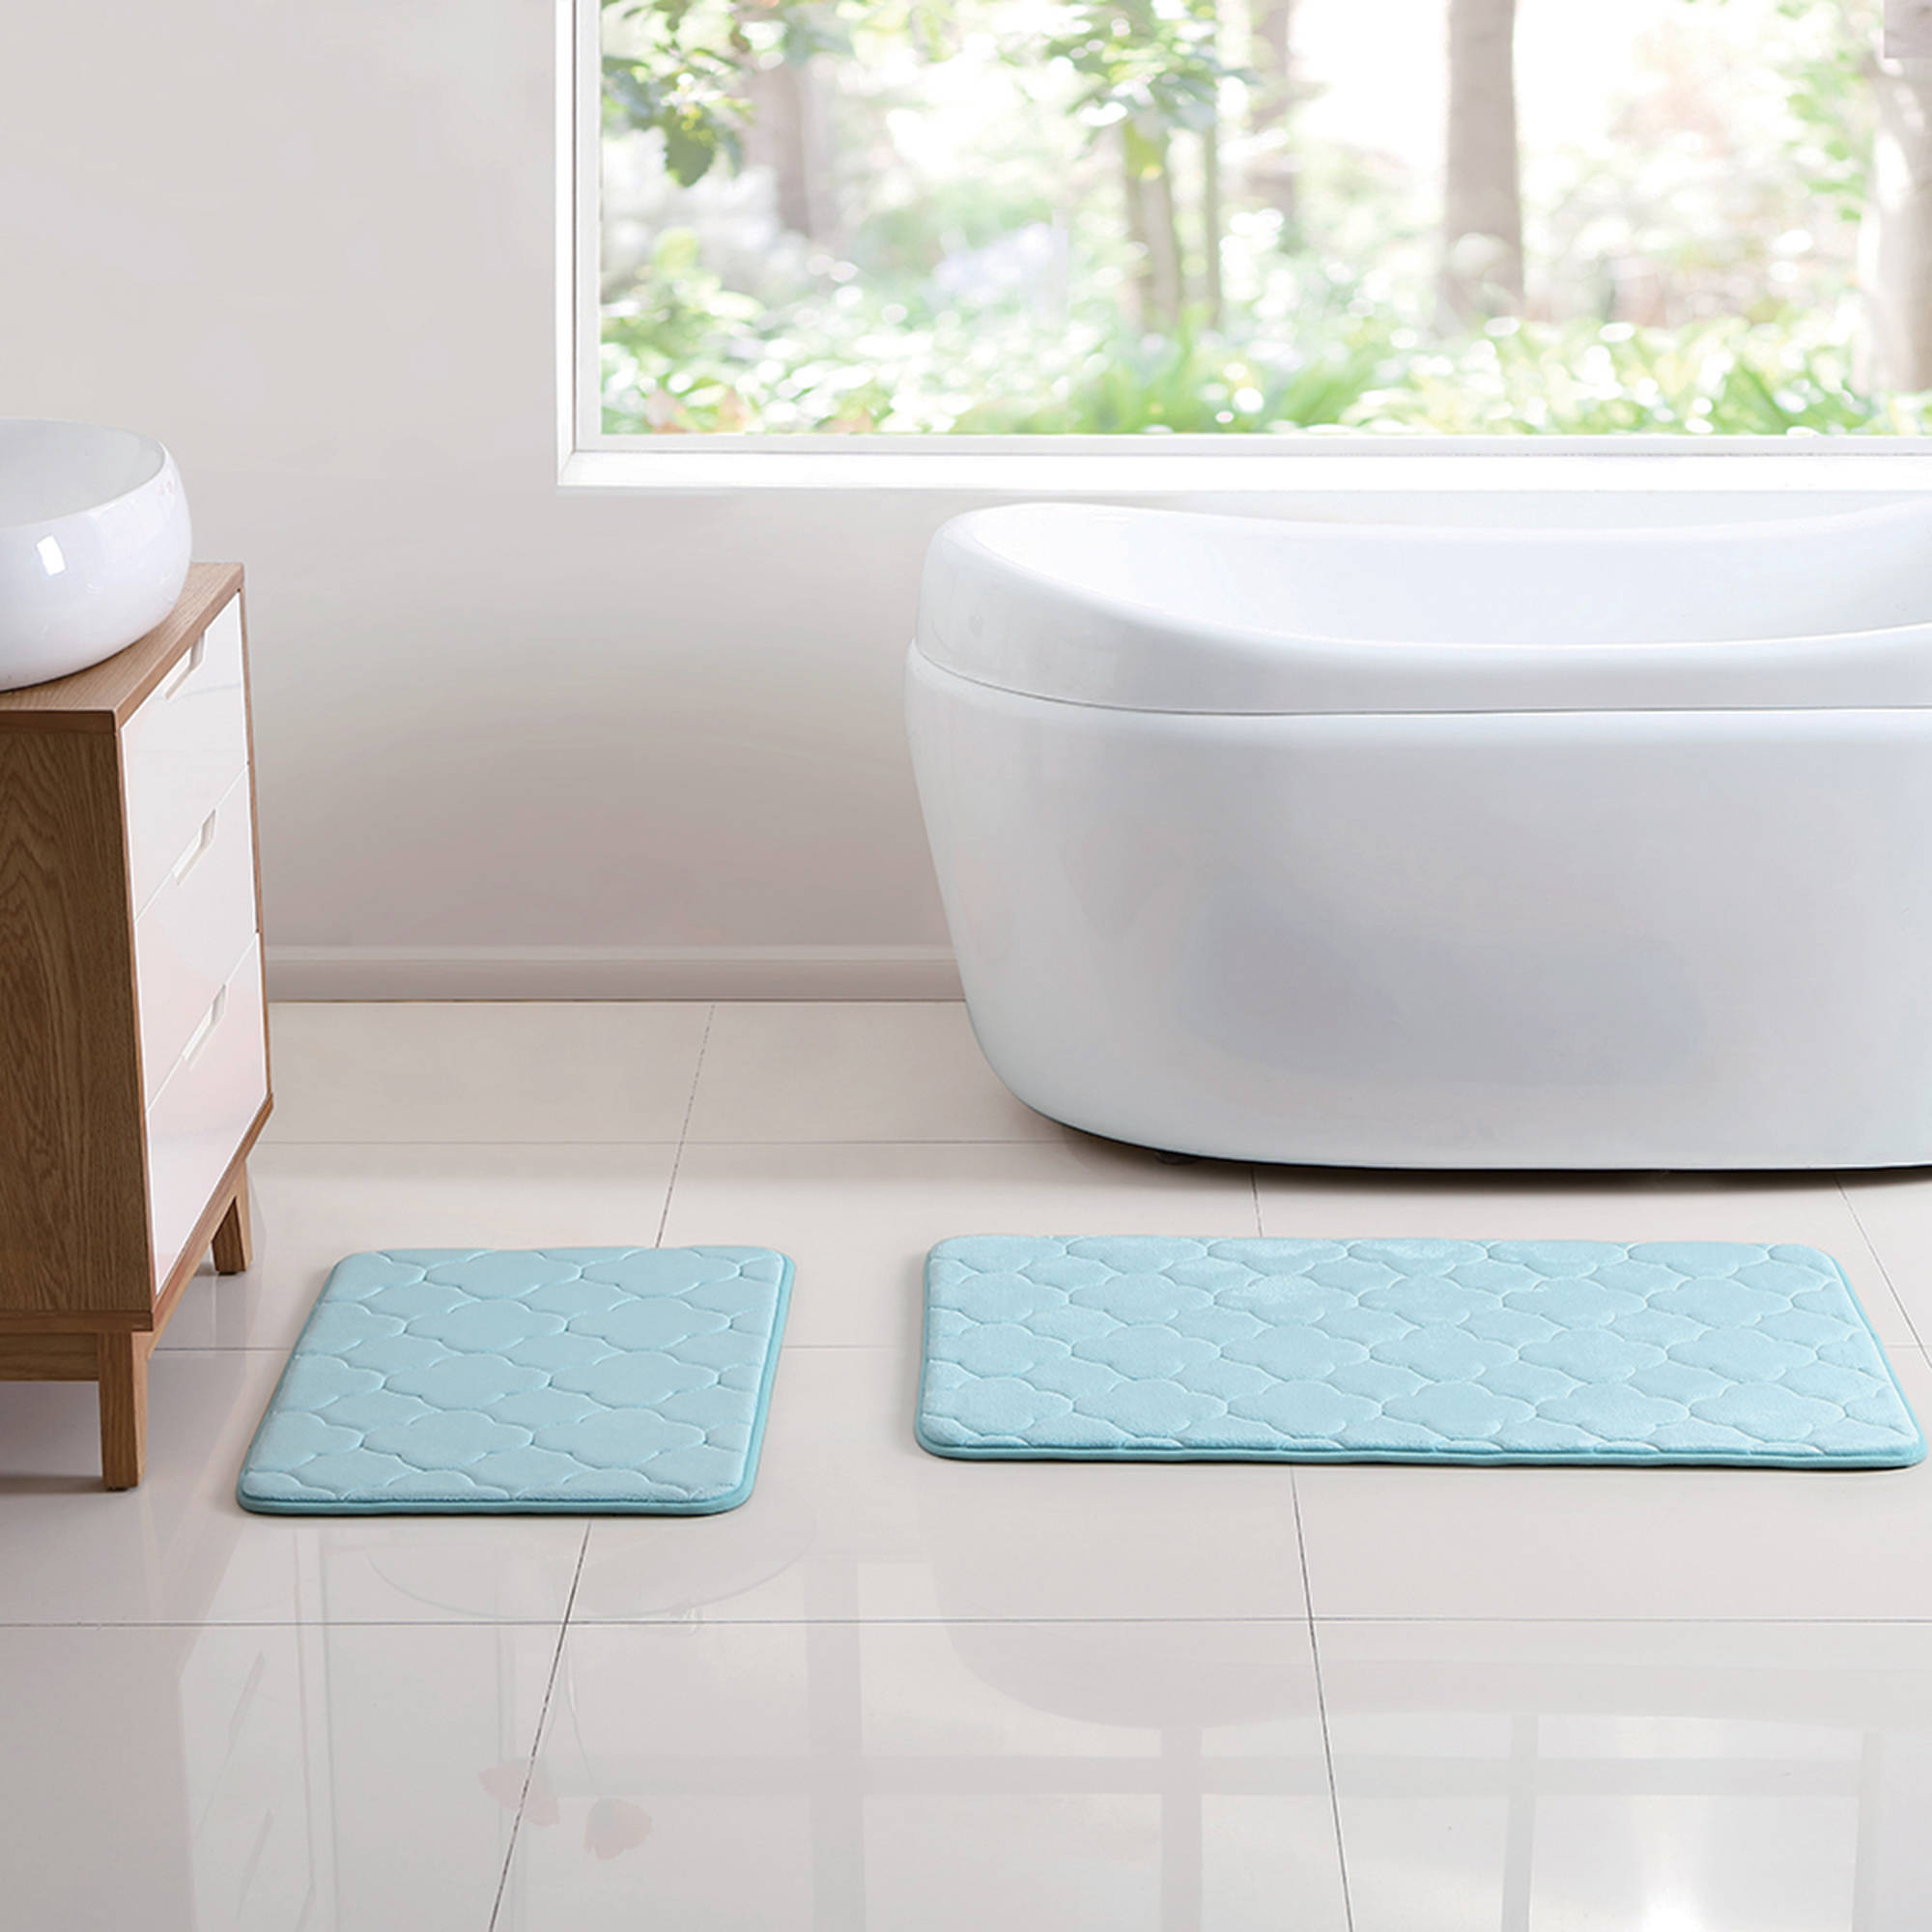 VCNY Home 2-Piece Quatrefoil Embossed Kaydence Memory Foam Bath Rug Set